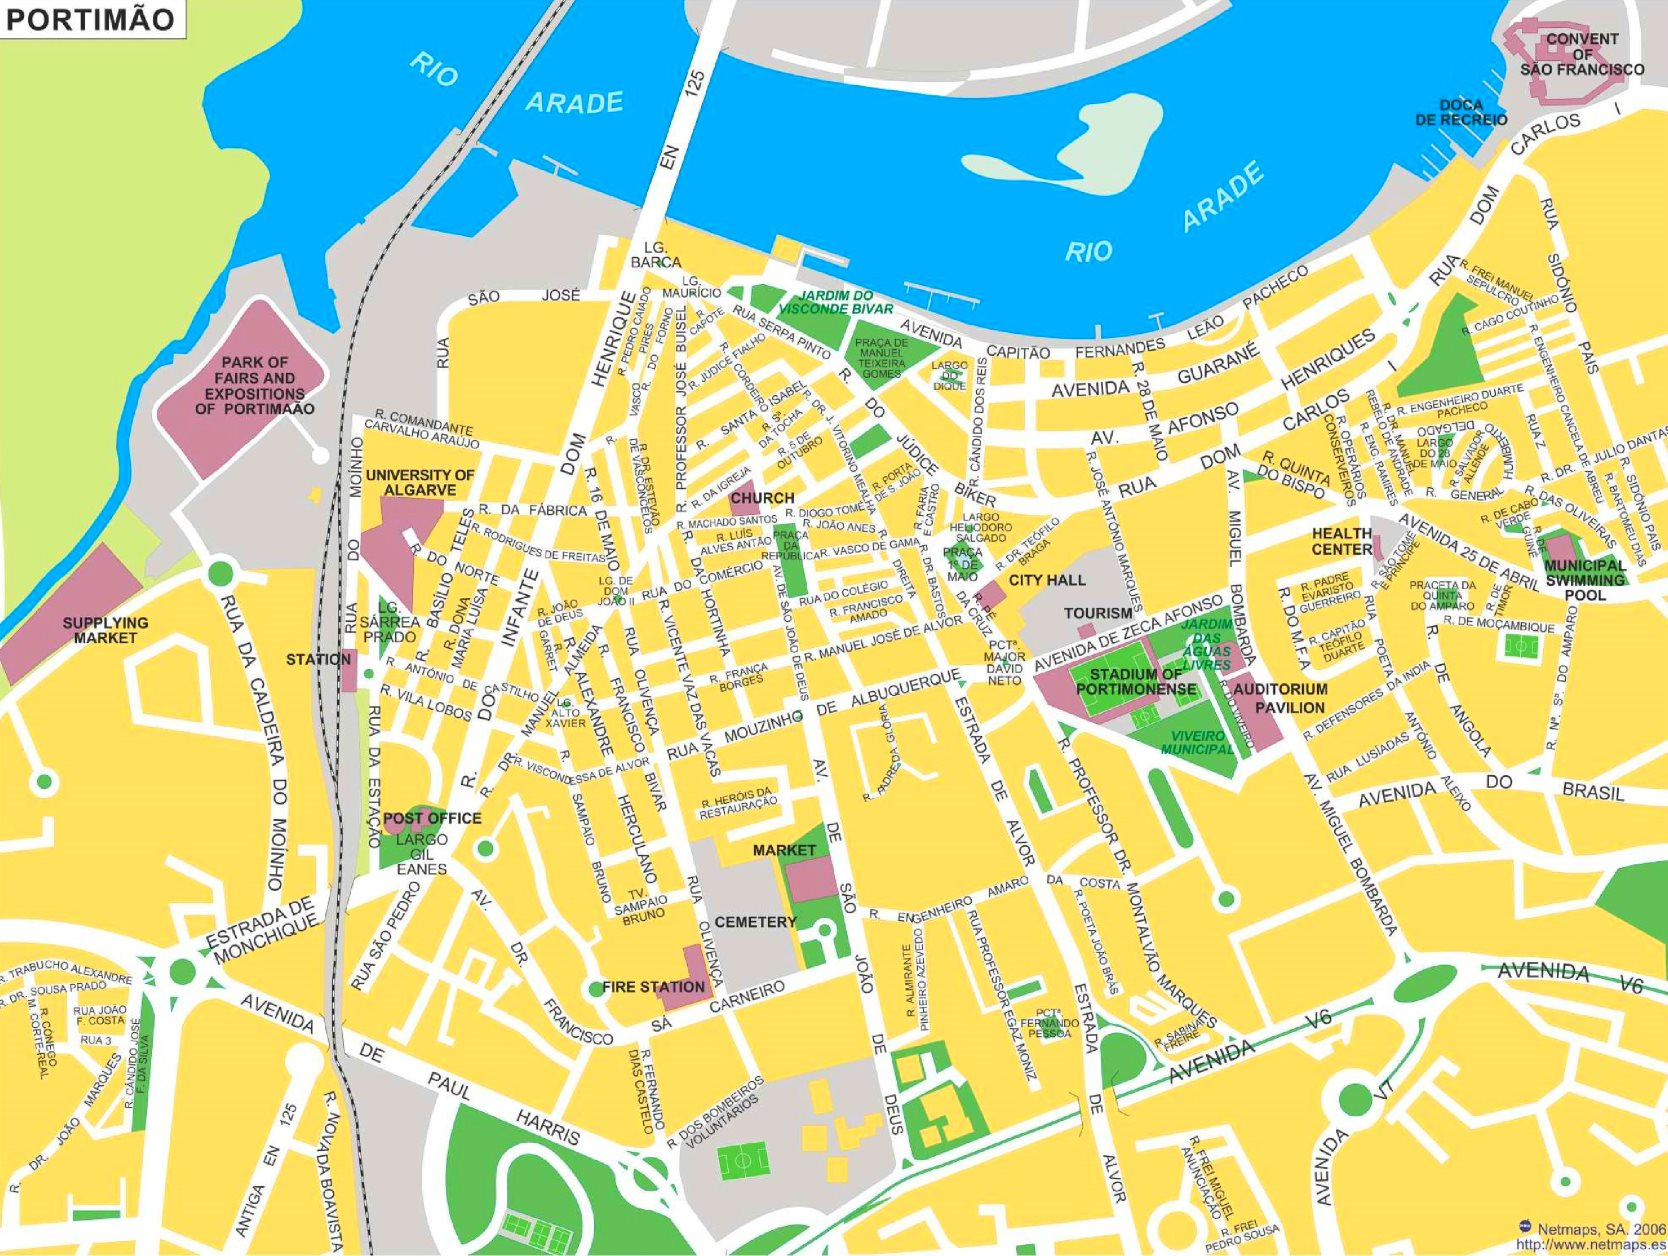 Portimao Tourist Map